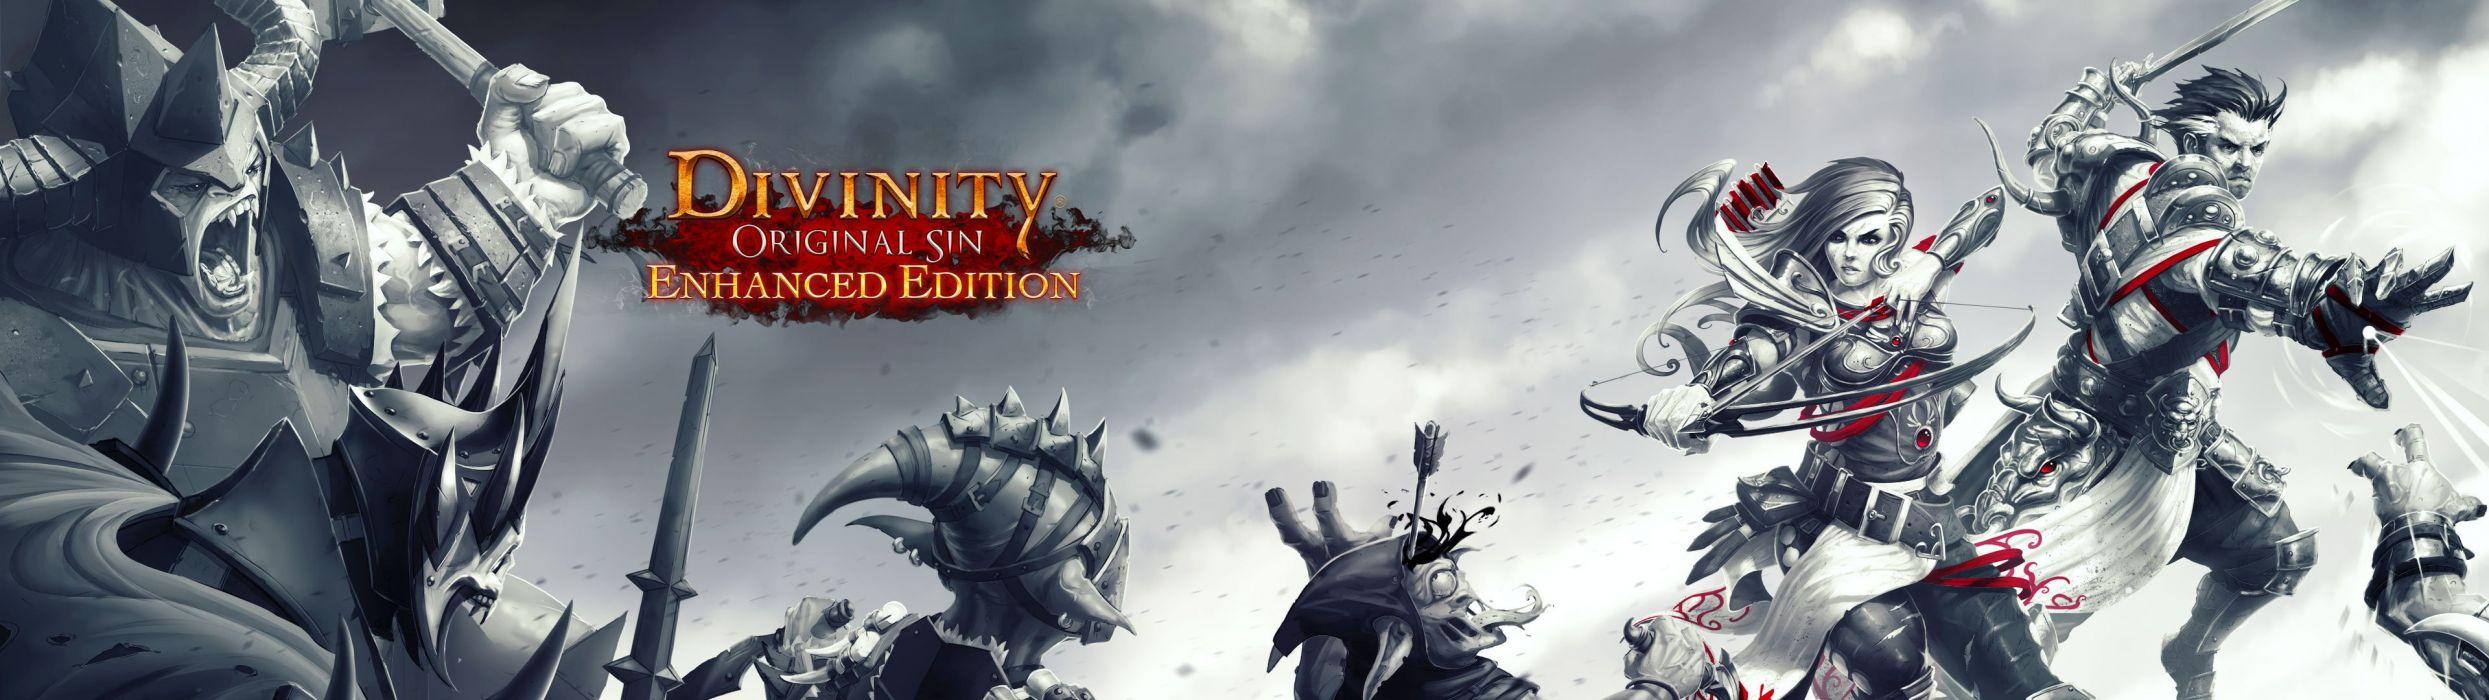 Divinity Original Sin Adventure Strategy Tactical Fantasy Sci Fi Warrior Rpg Online 1dosin Action Fighting Wallpaper 3840x1080 717701 Wallpaperup